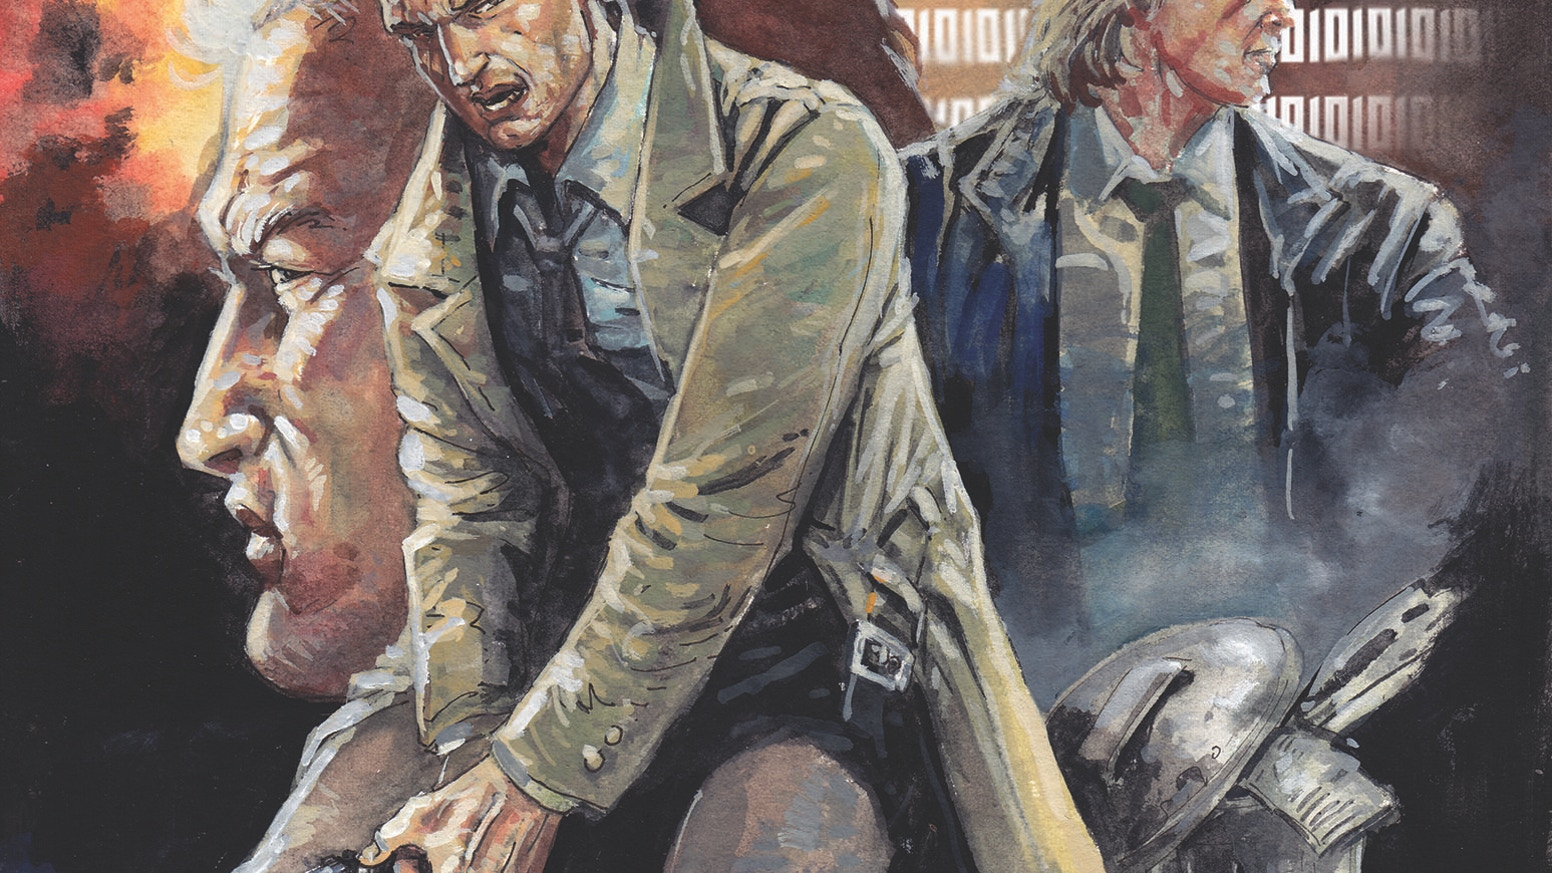 WIRED VOLUME 1 by James Lundy — Kickstarter